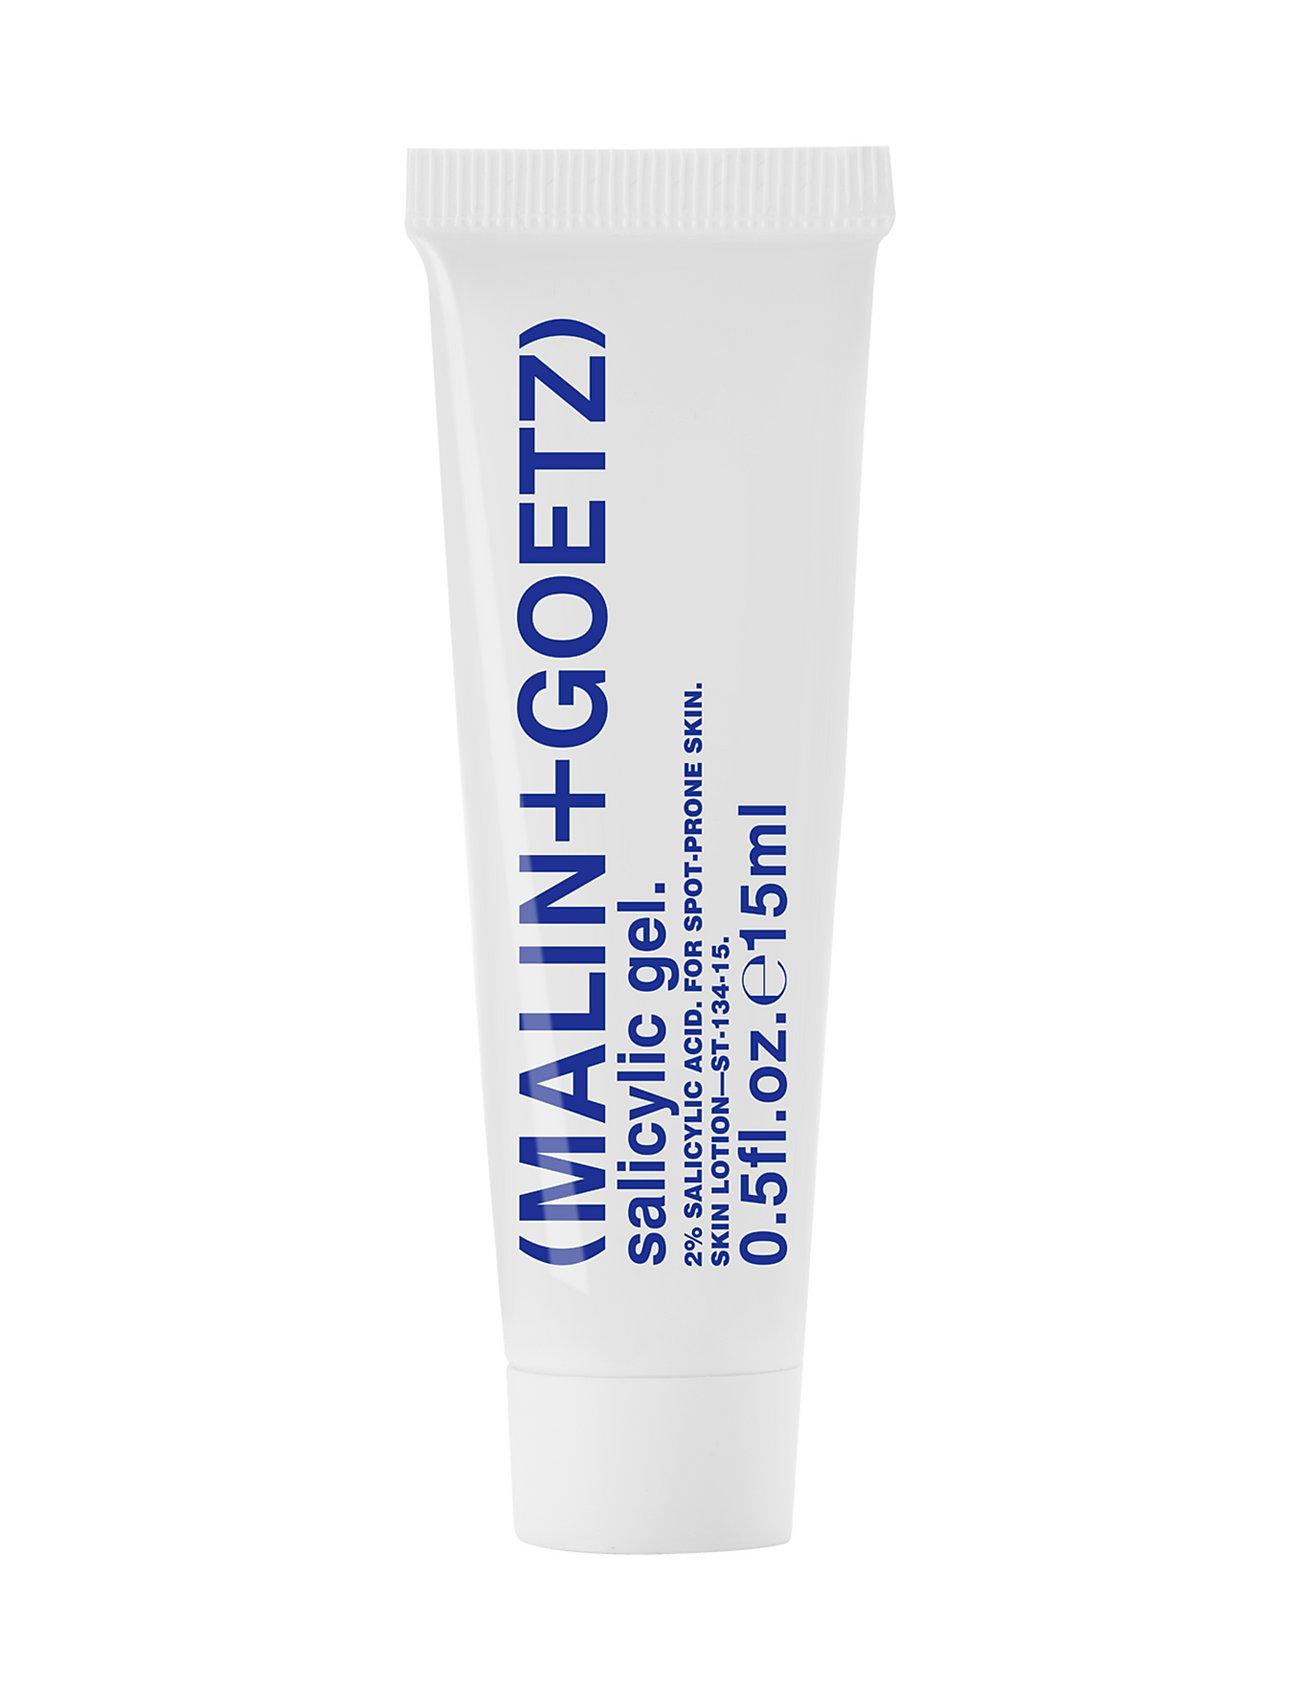 malin+goetz – Salicylic gel på boozt.com dk